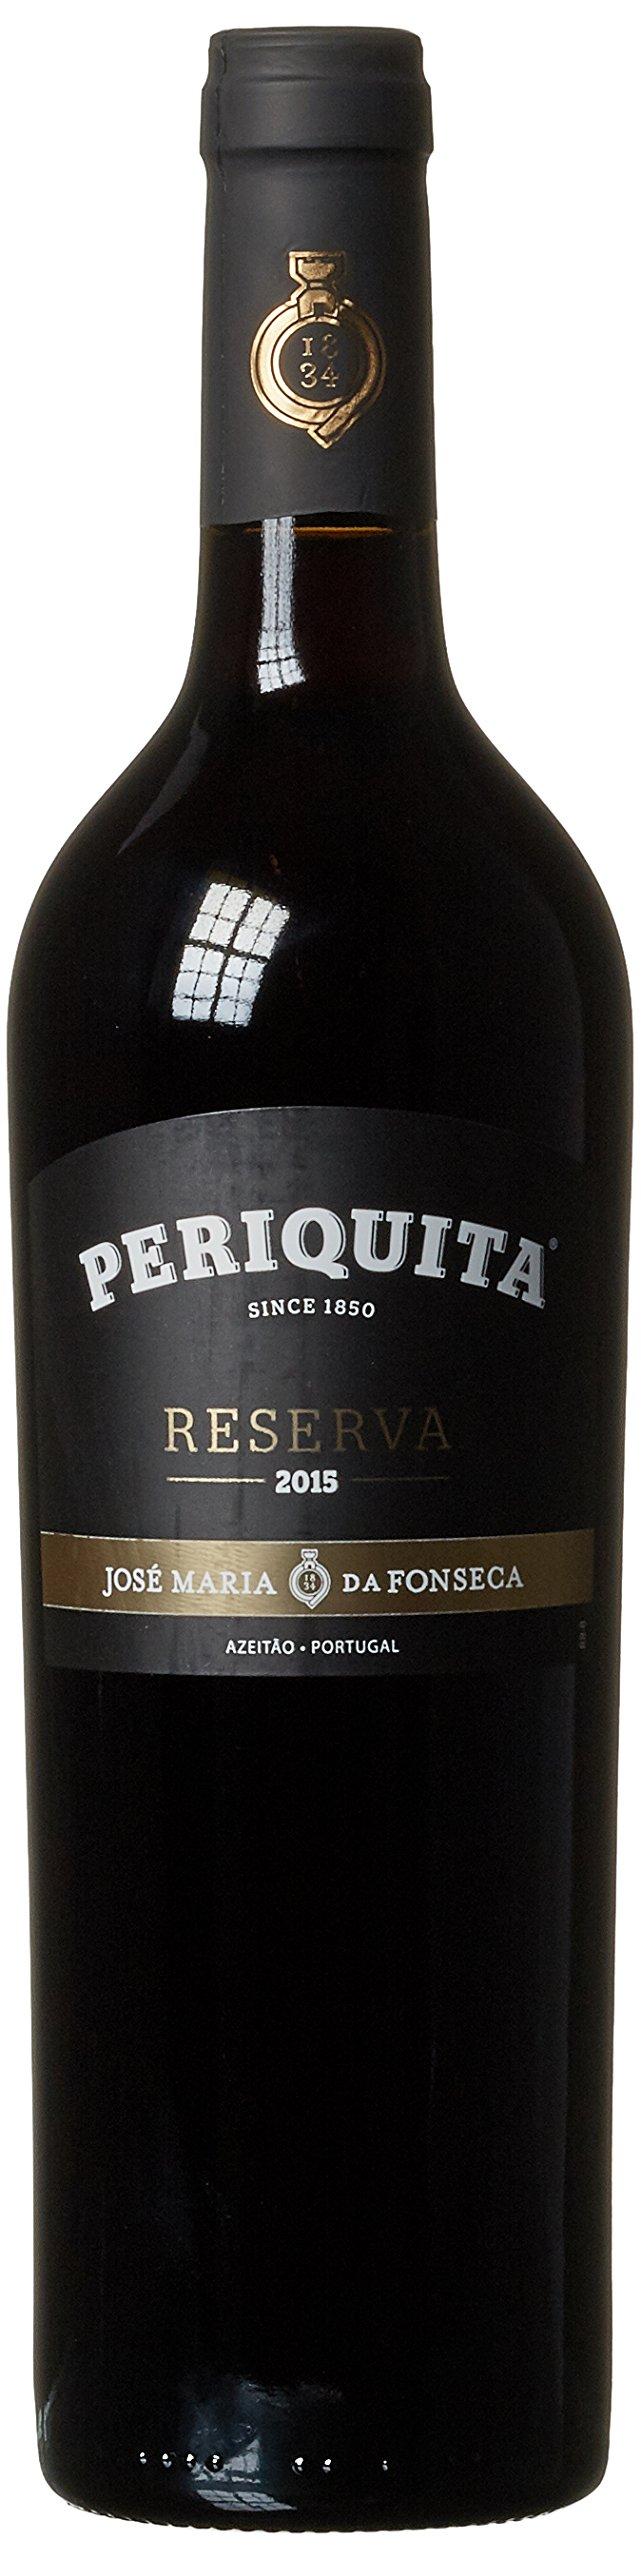 Jos-Maria-da-Fonseca-Periquita-Reserva-VR-3er-Pack-3-x-750-ml